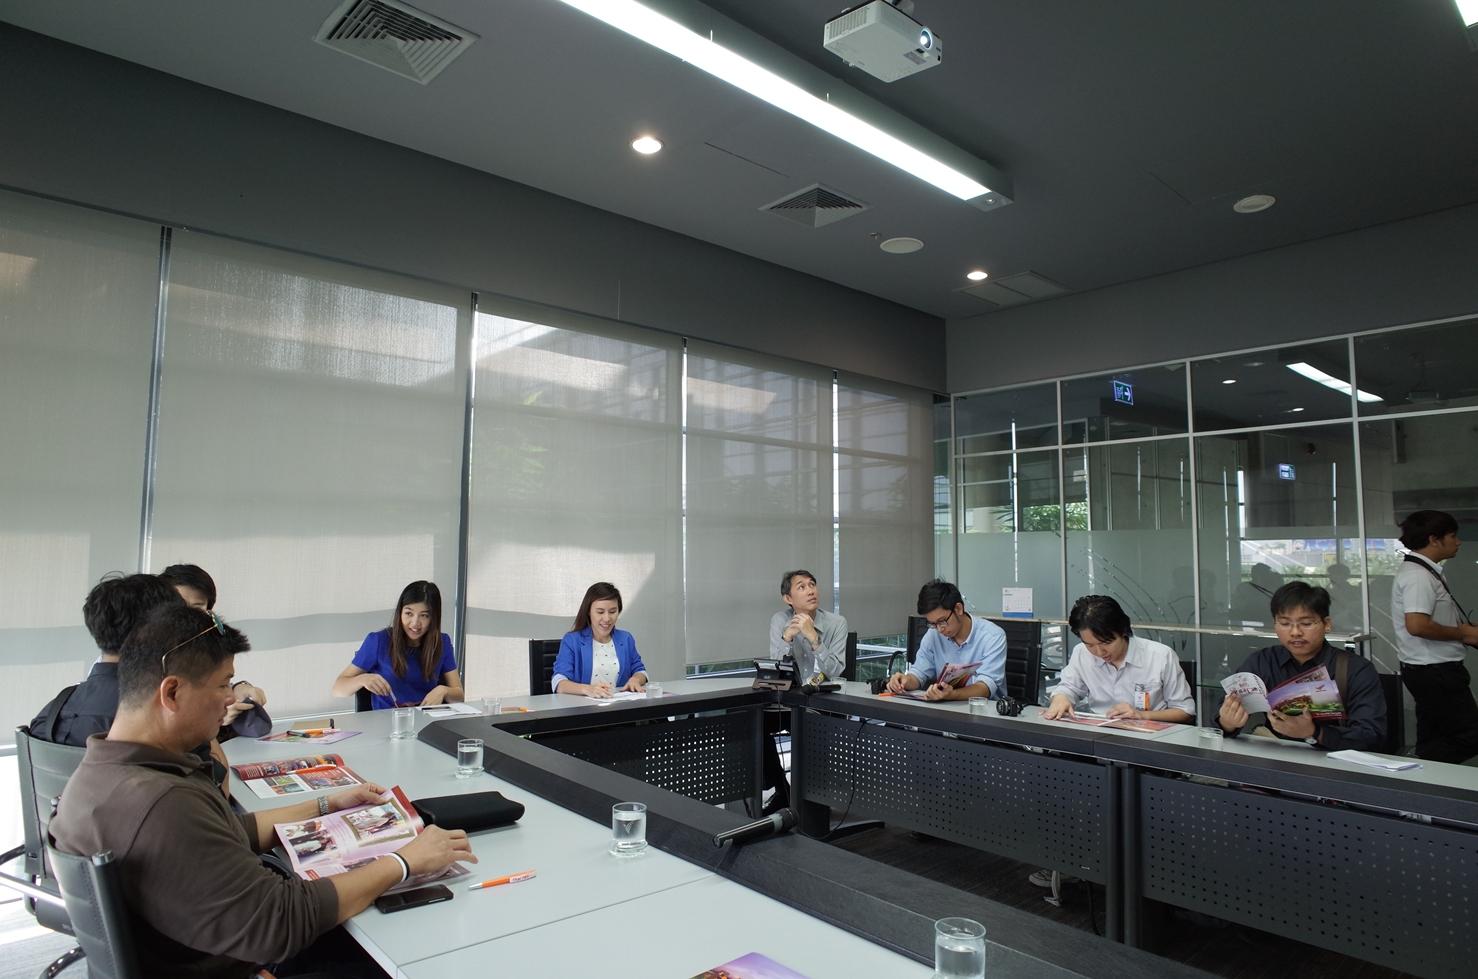 Steven Leach + Associates, Bangkok  – Architectural, Interior Design and Project Management Services